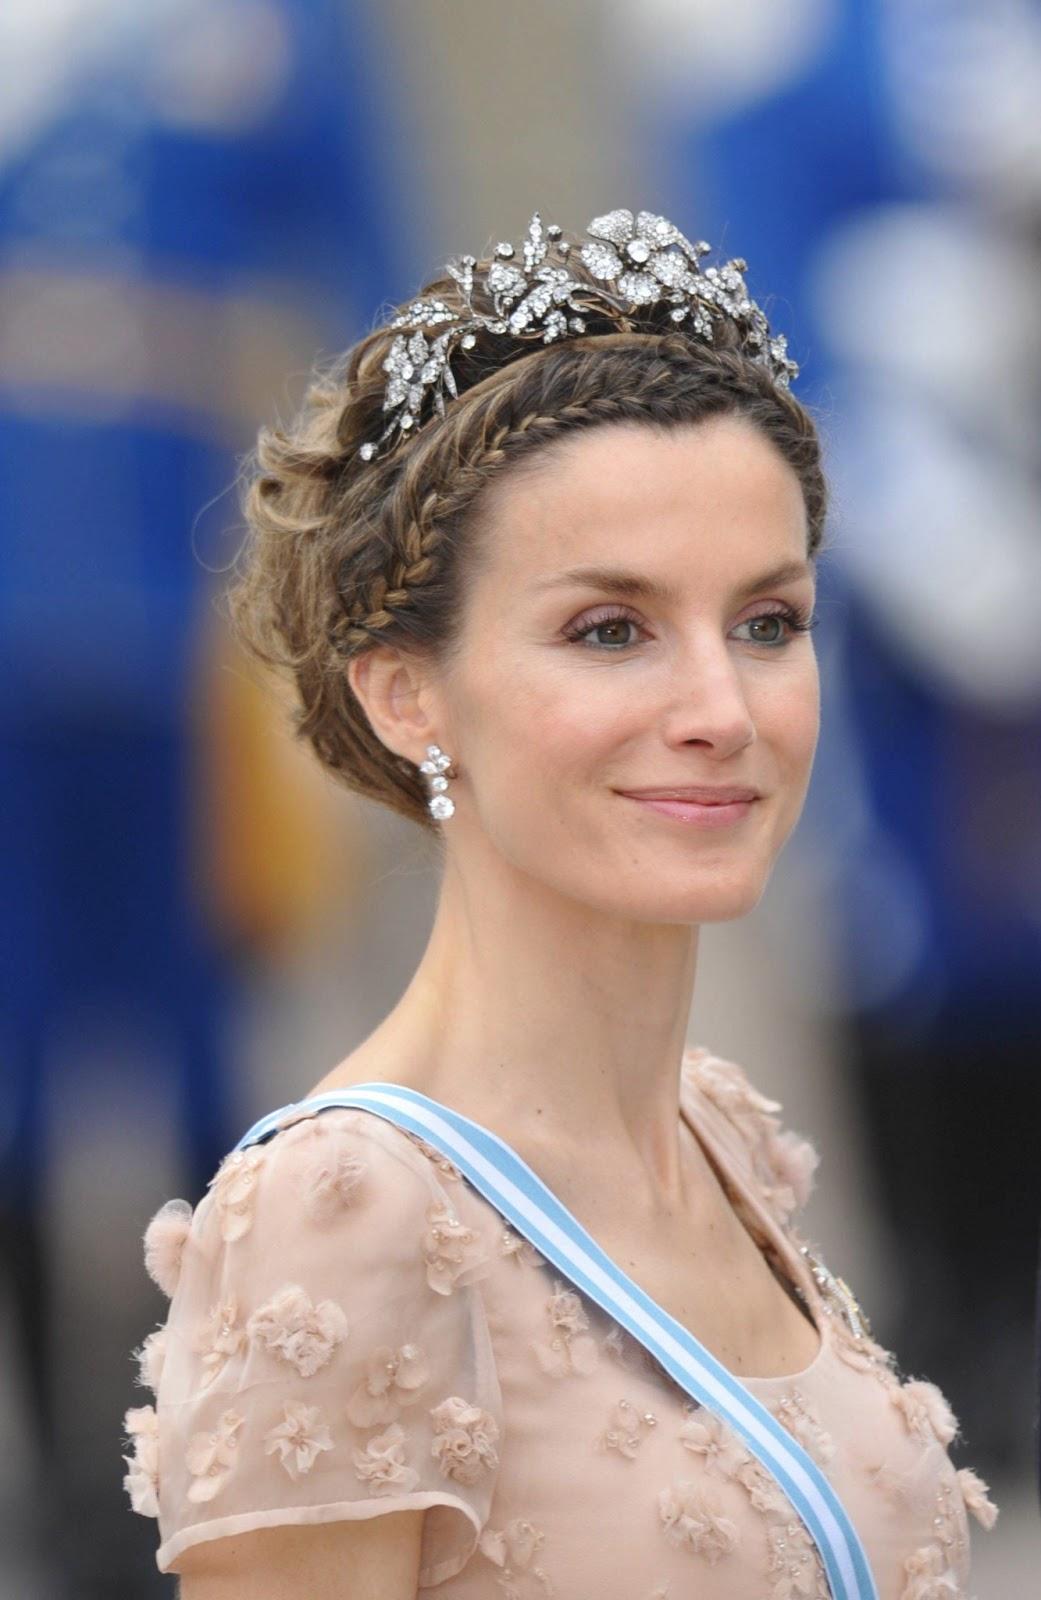 Marie Poutines Jewels amp Royals Queen Letizia of Spain : princessletiziaspaindiamondtiara from maries-jewels-royals.blogspot.com size 1041 x 1600 jpeg 162kB